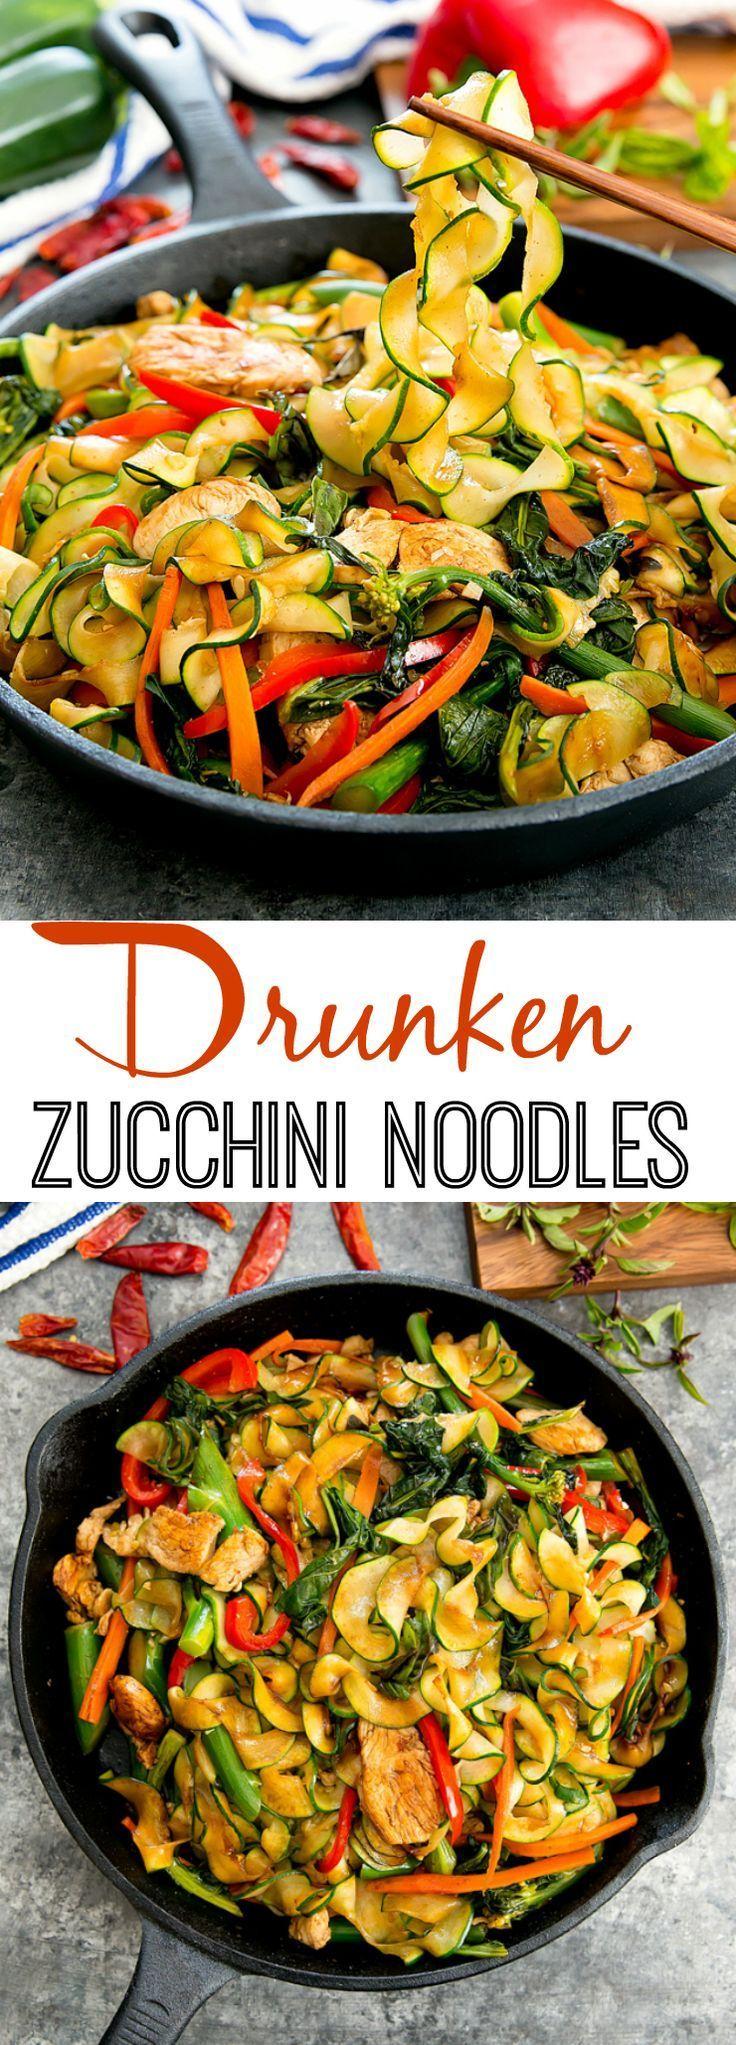 Drunken Zucchini Noo  Drunken Zucchini Noodles. Light, low carb version of the popular Thai dish.